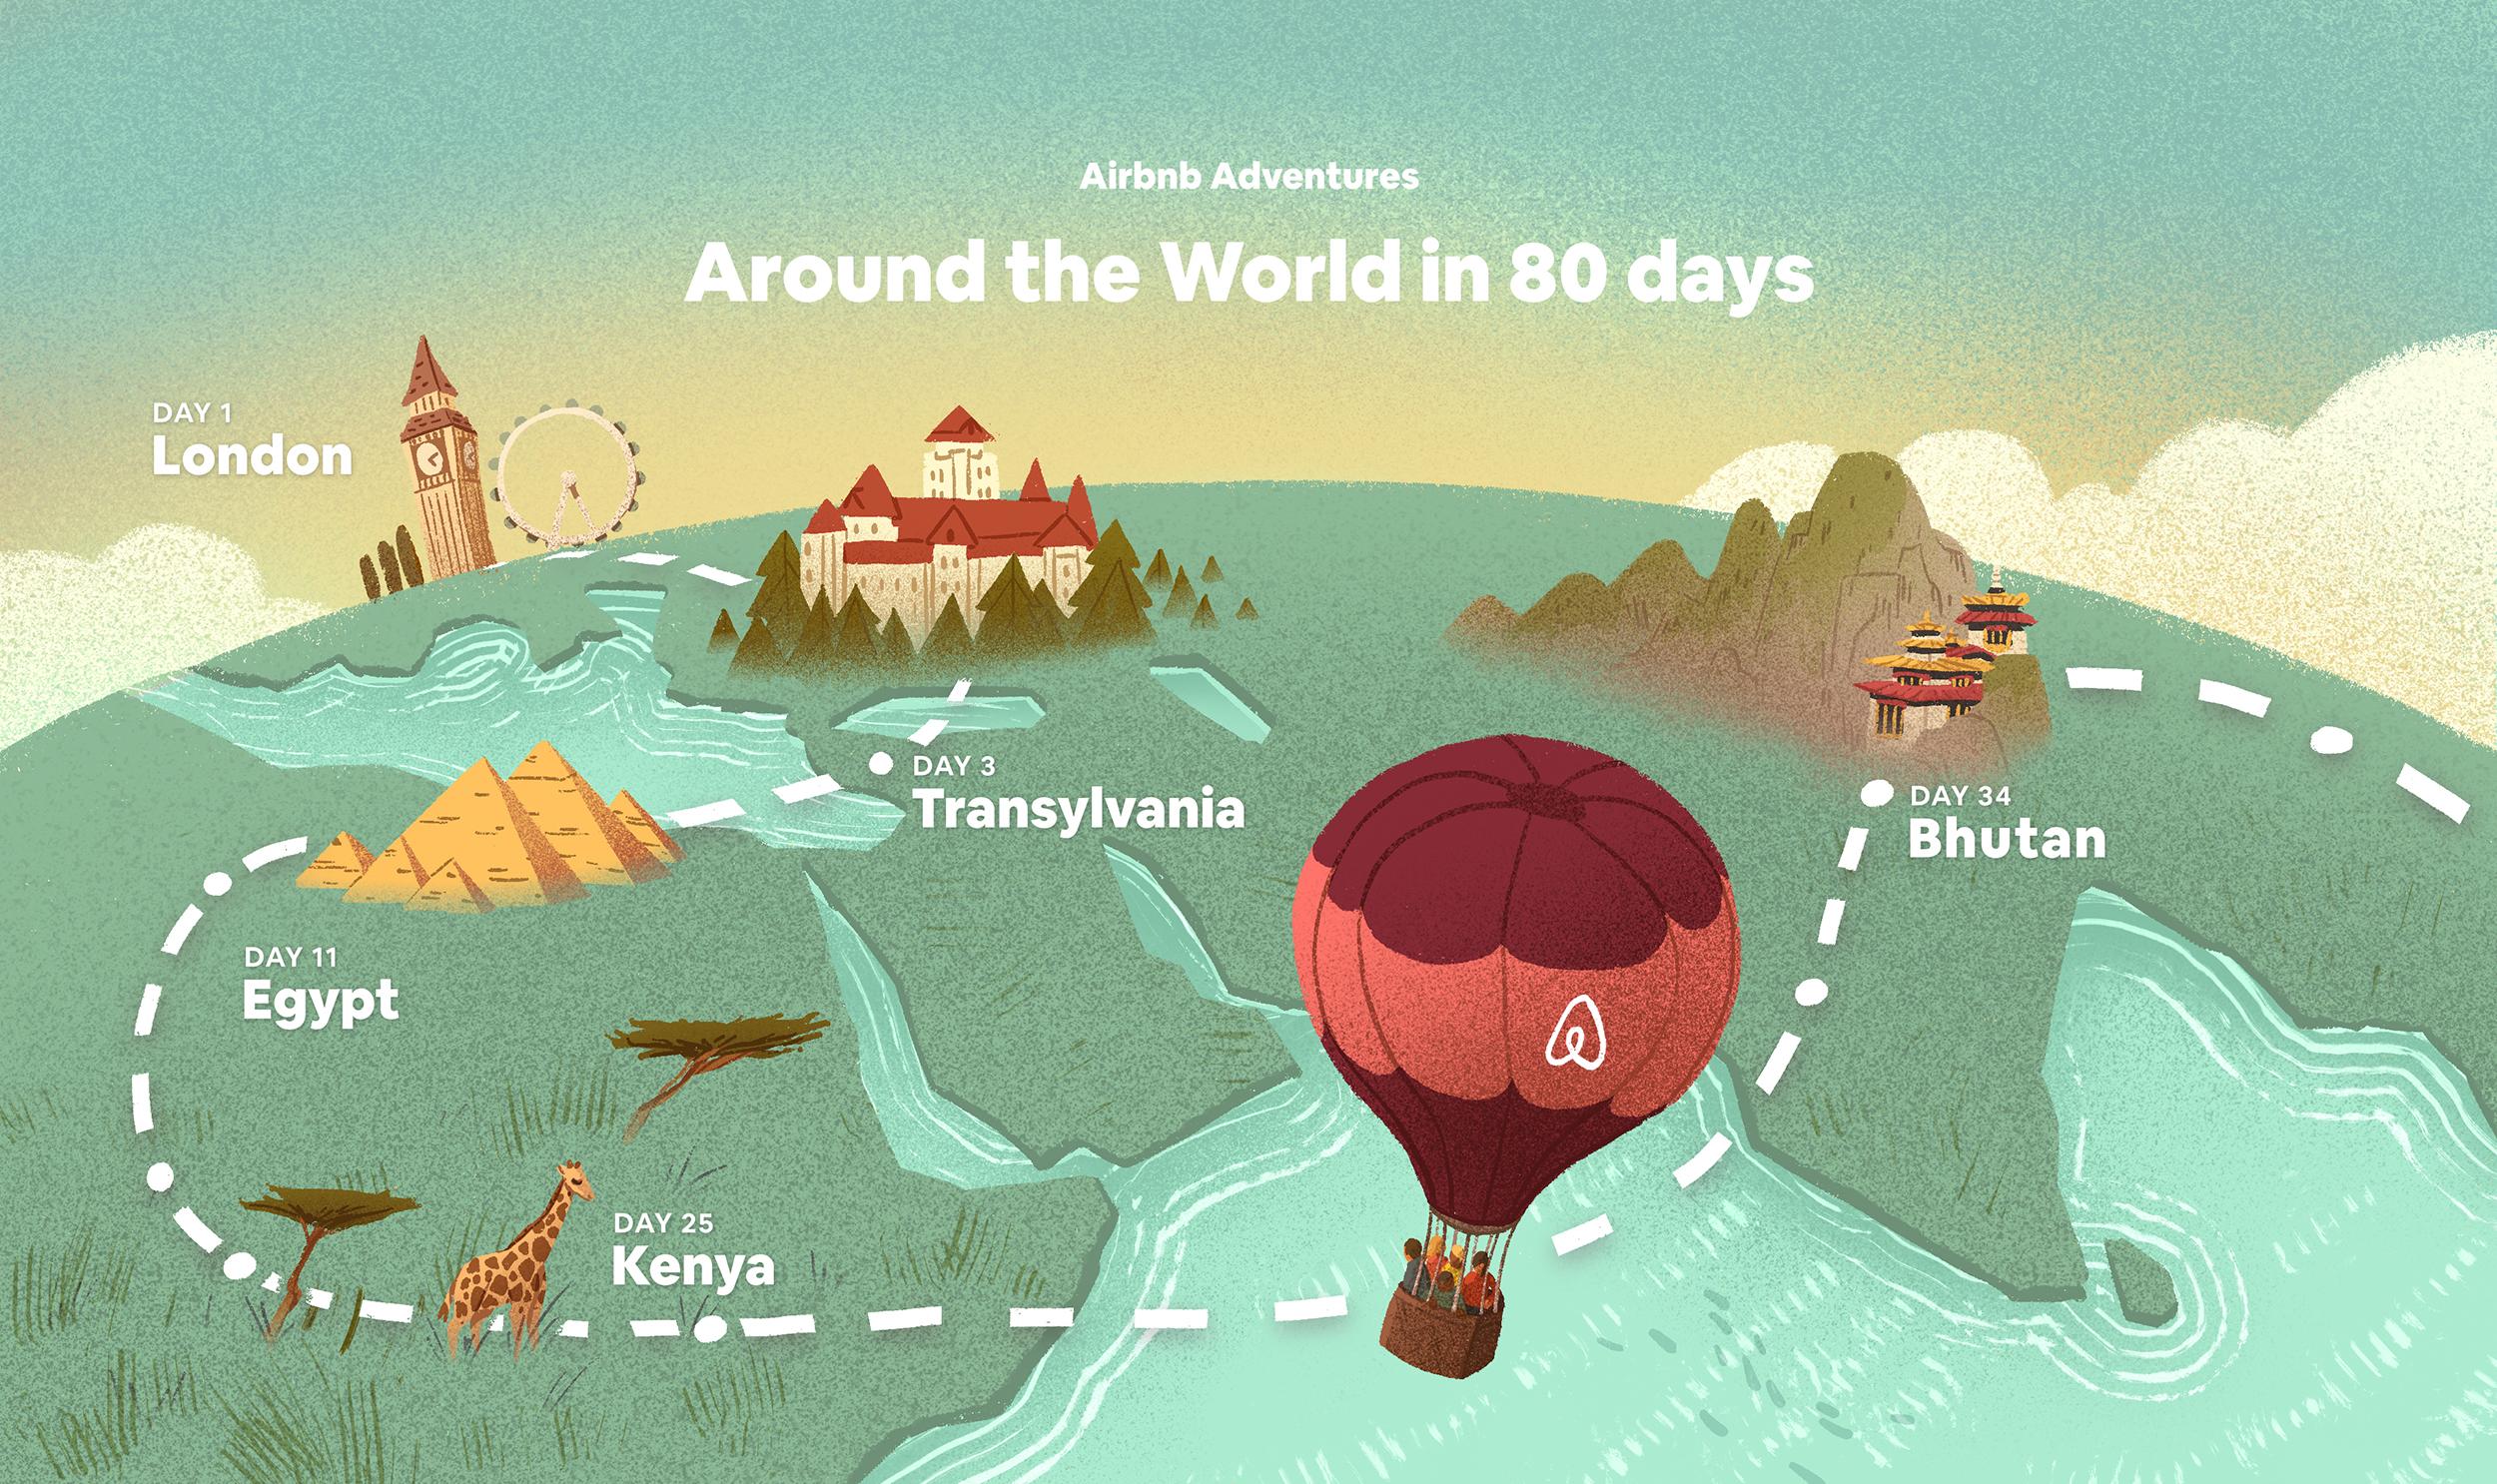 resumen de la vuelta al mundo en 80 dias